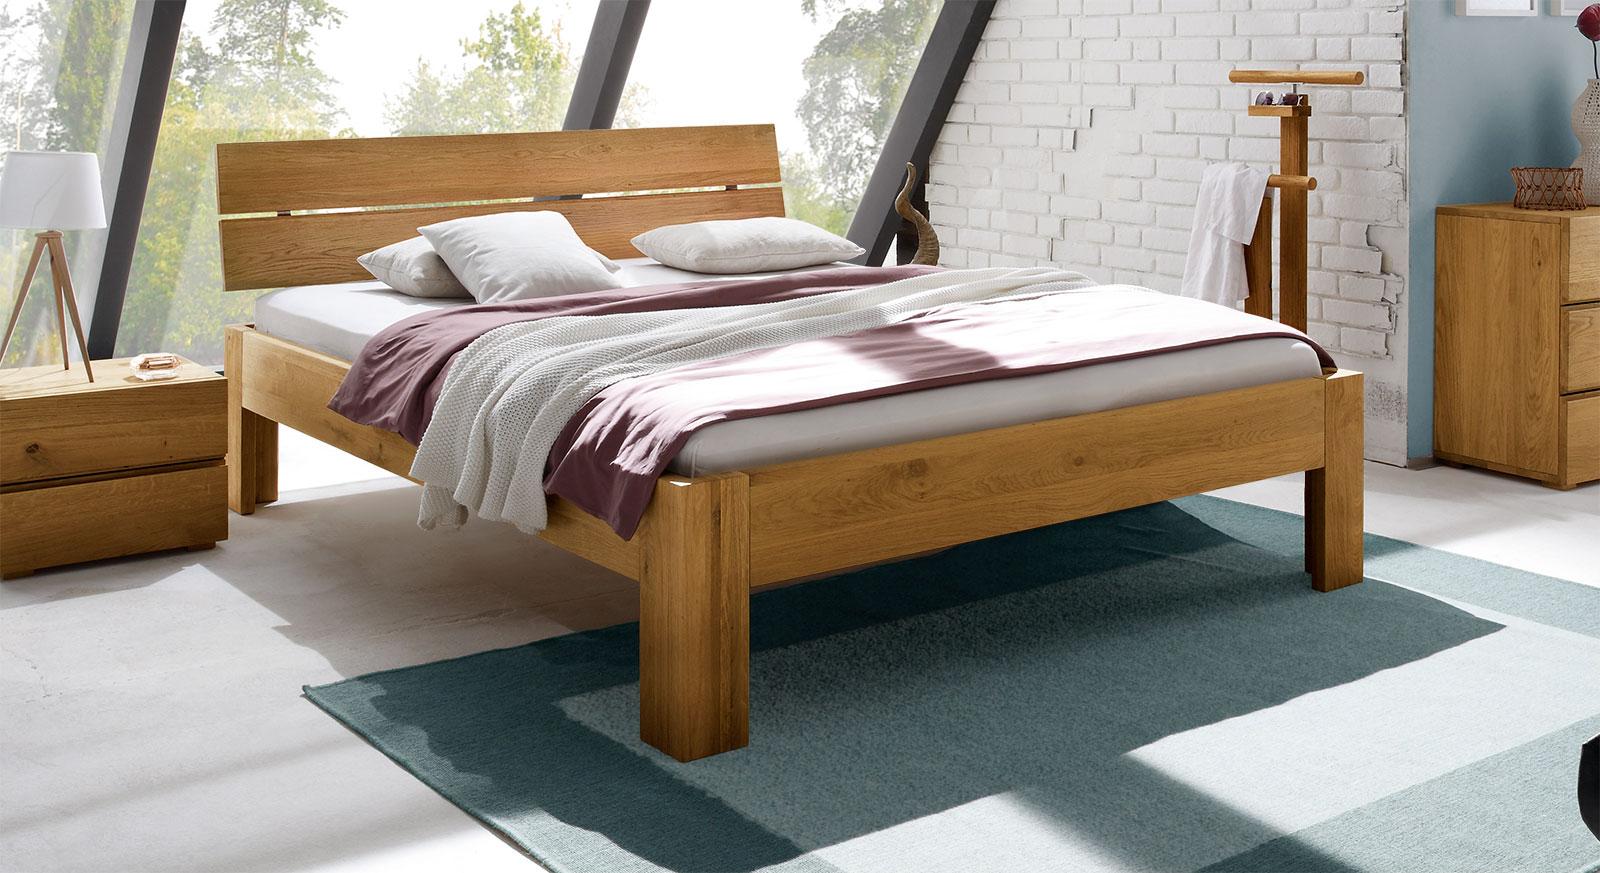 Bett Bayamo in 25cm Höhe, Eiche naturfarben